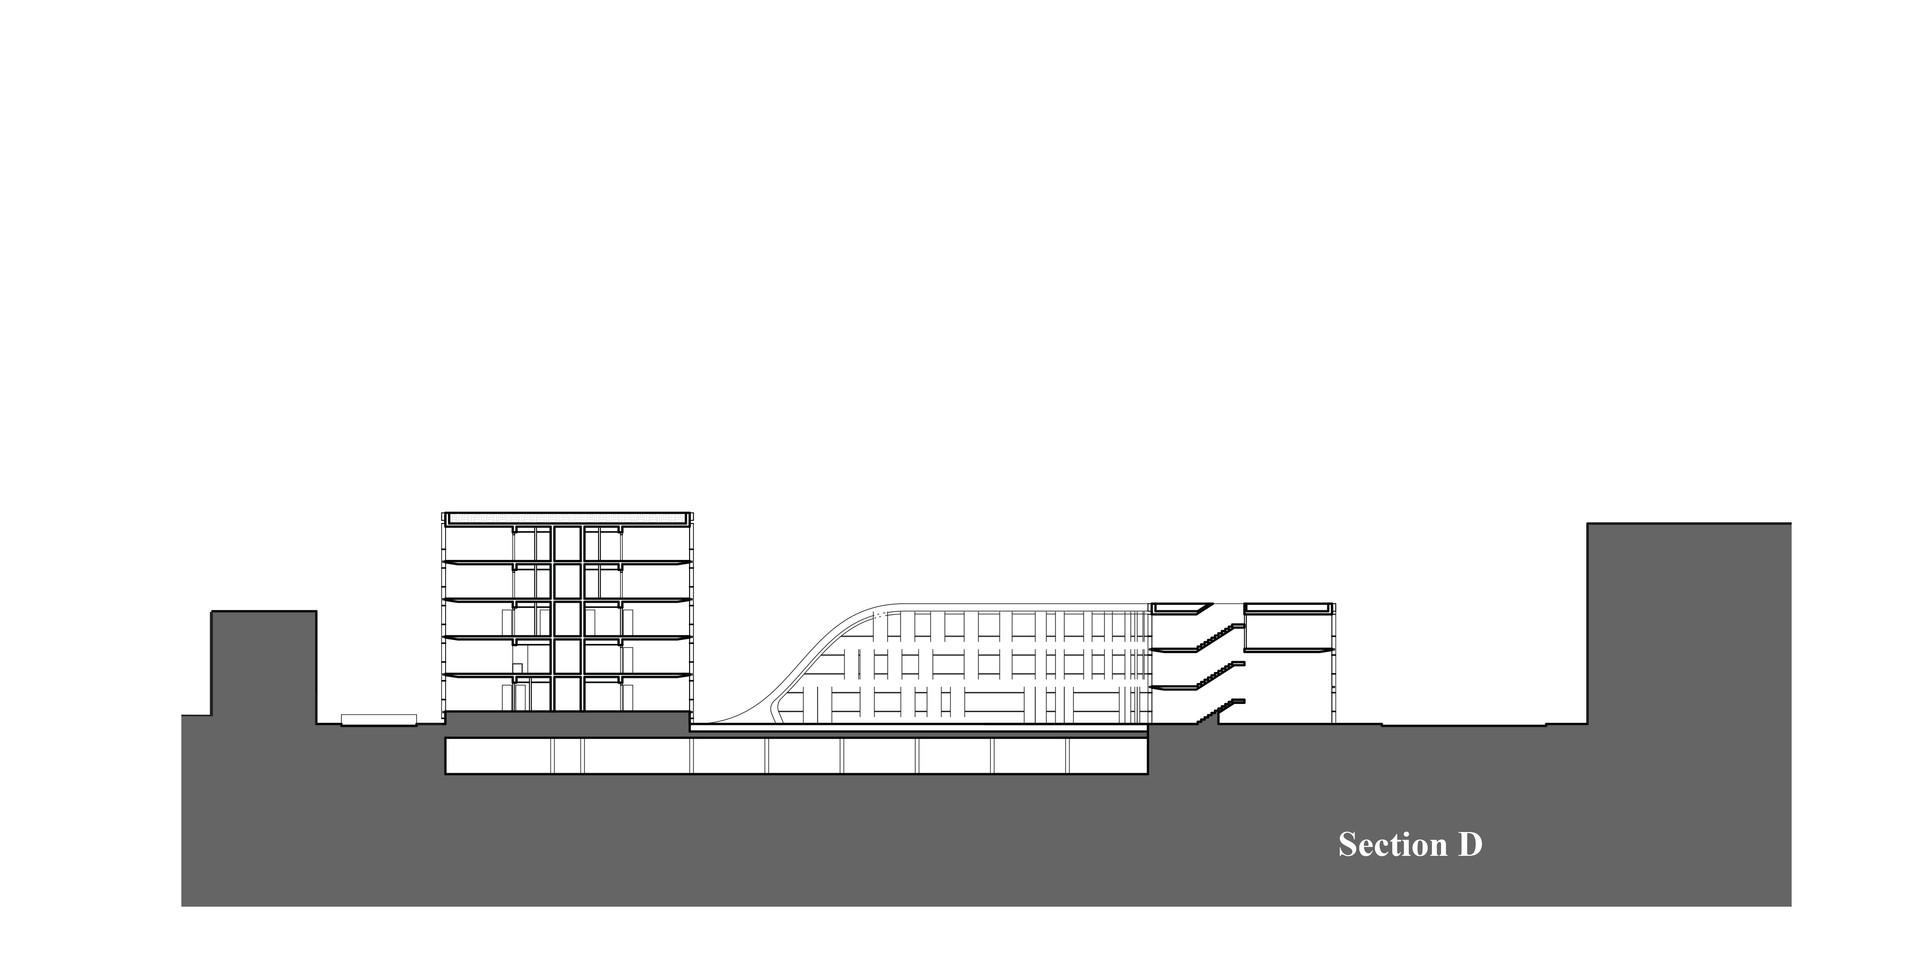 New Urban Village Christchurch Section